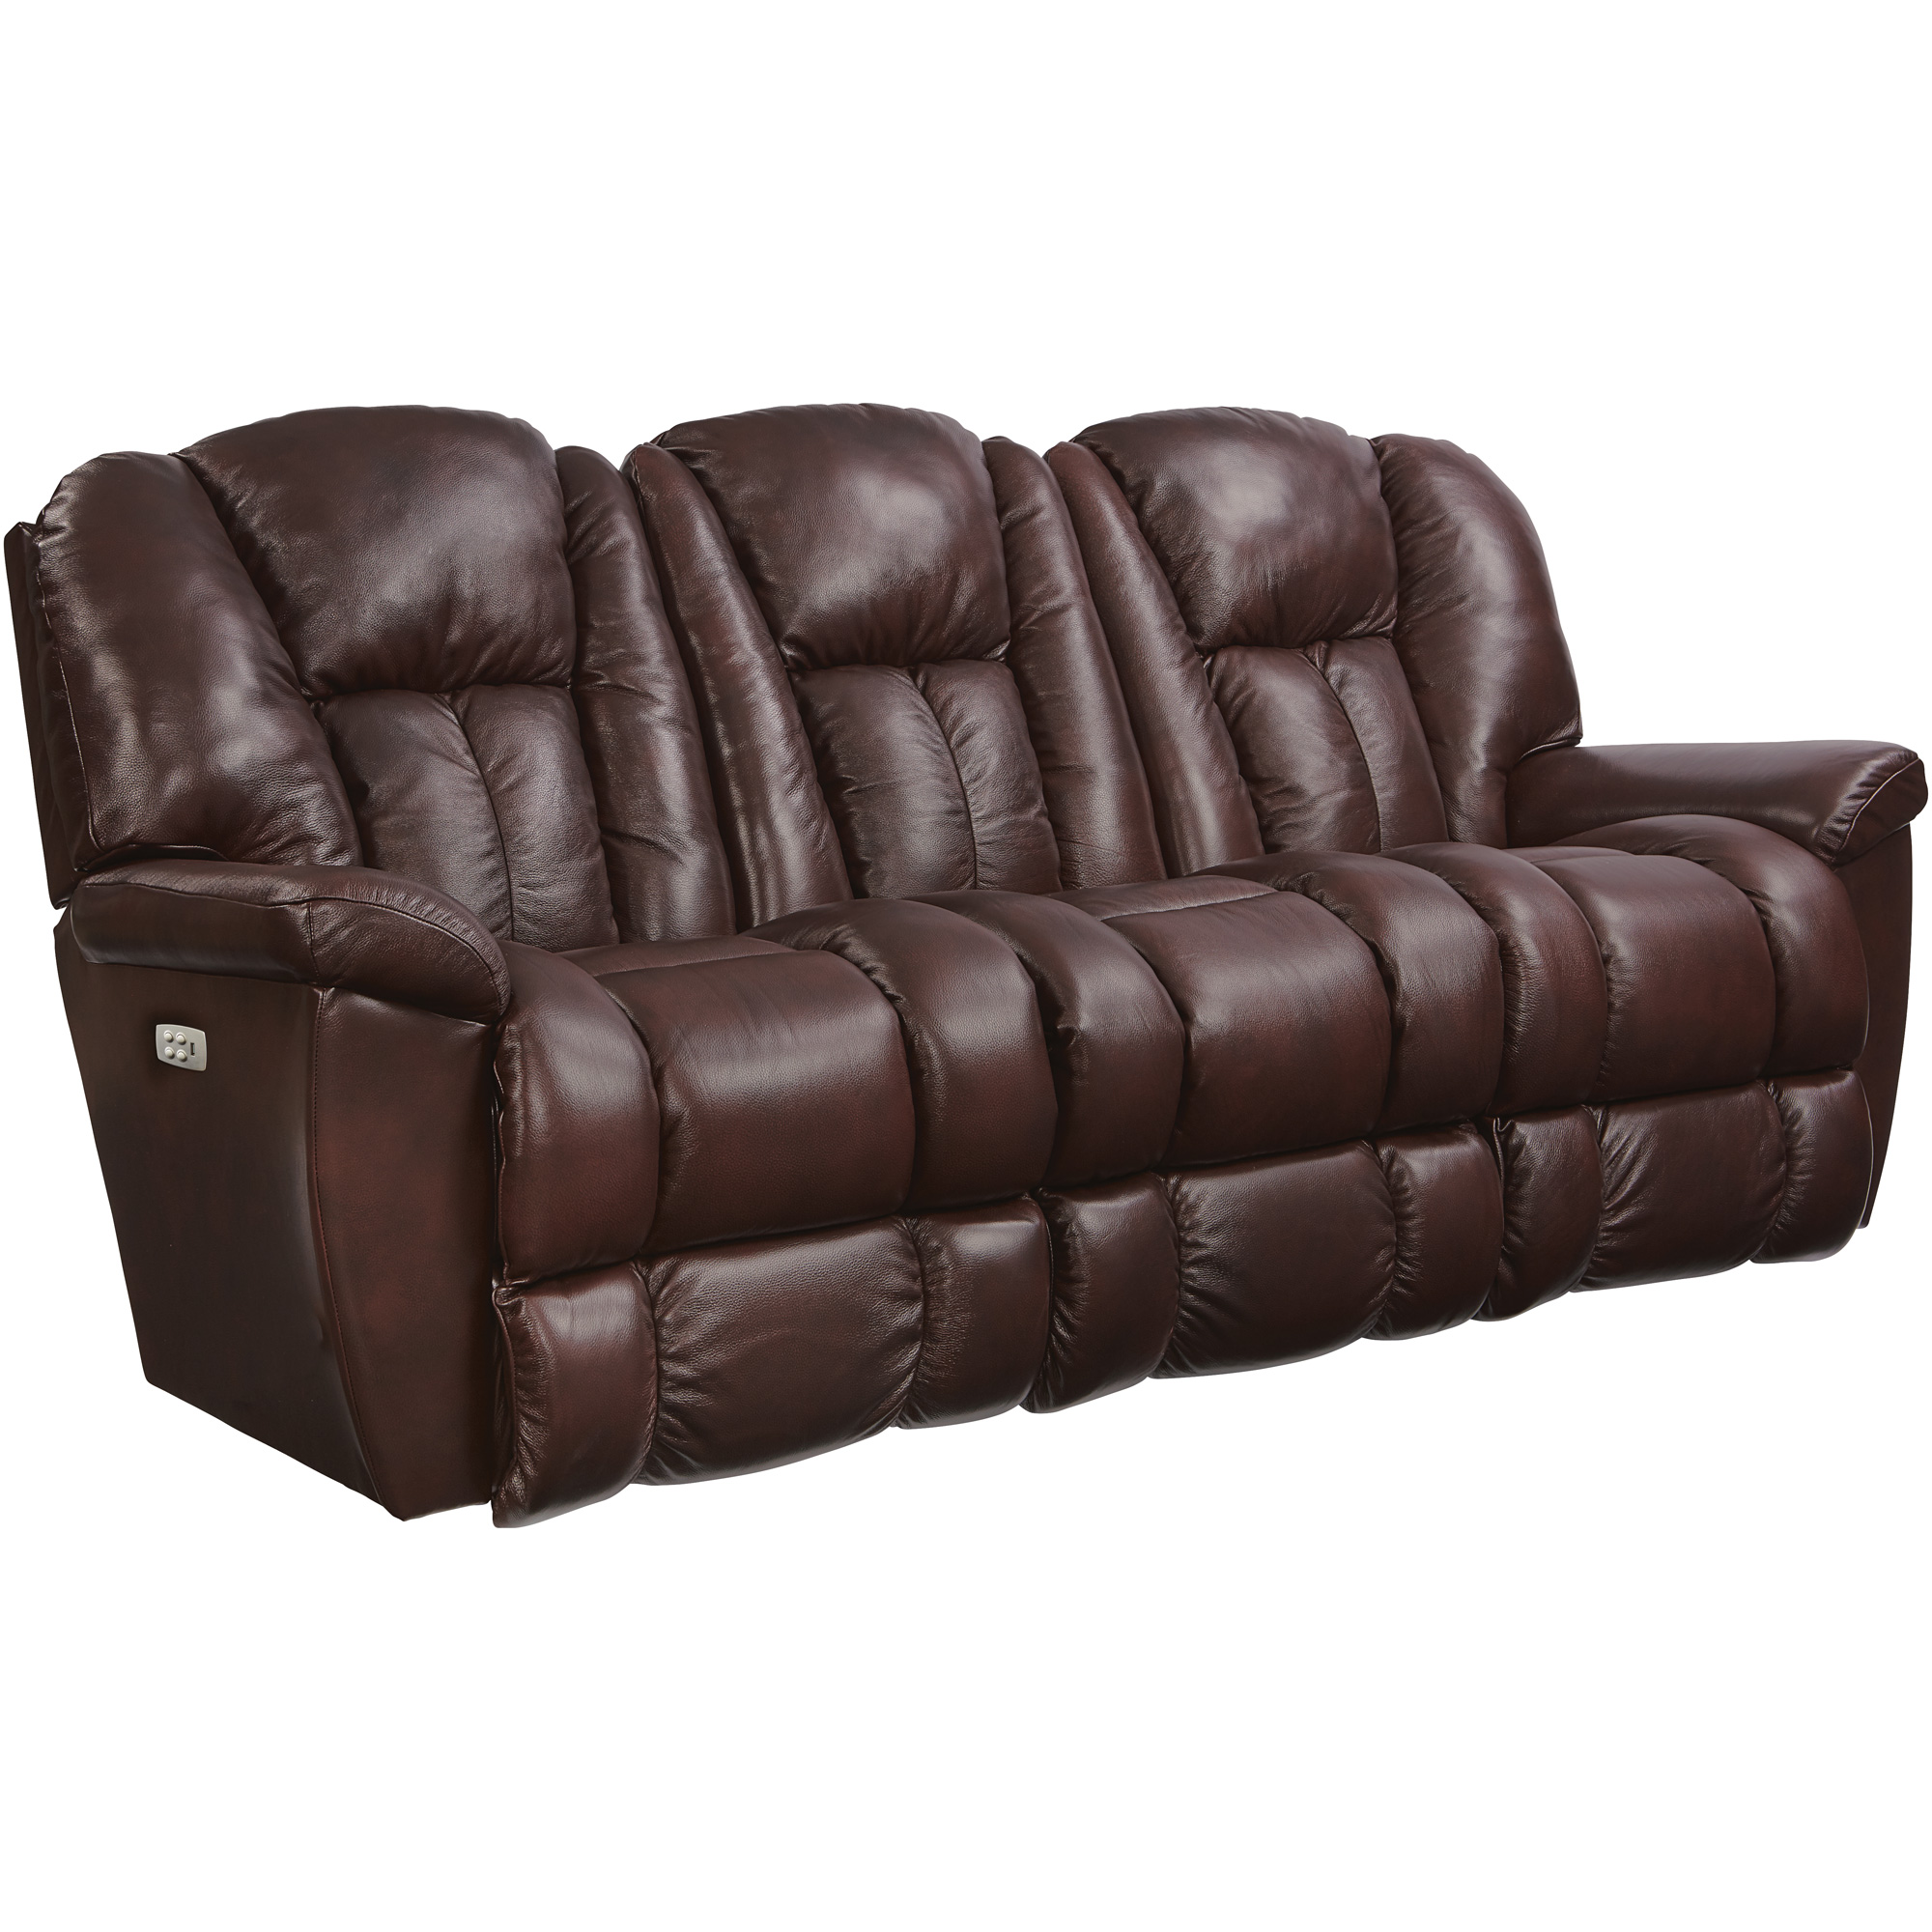 Slumberland Furniture | Maverick Burgundy Power Reclining Sofa